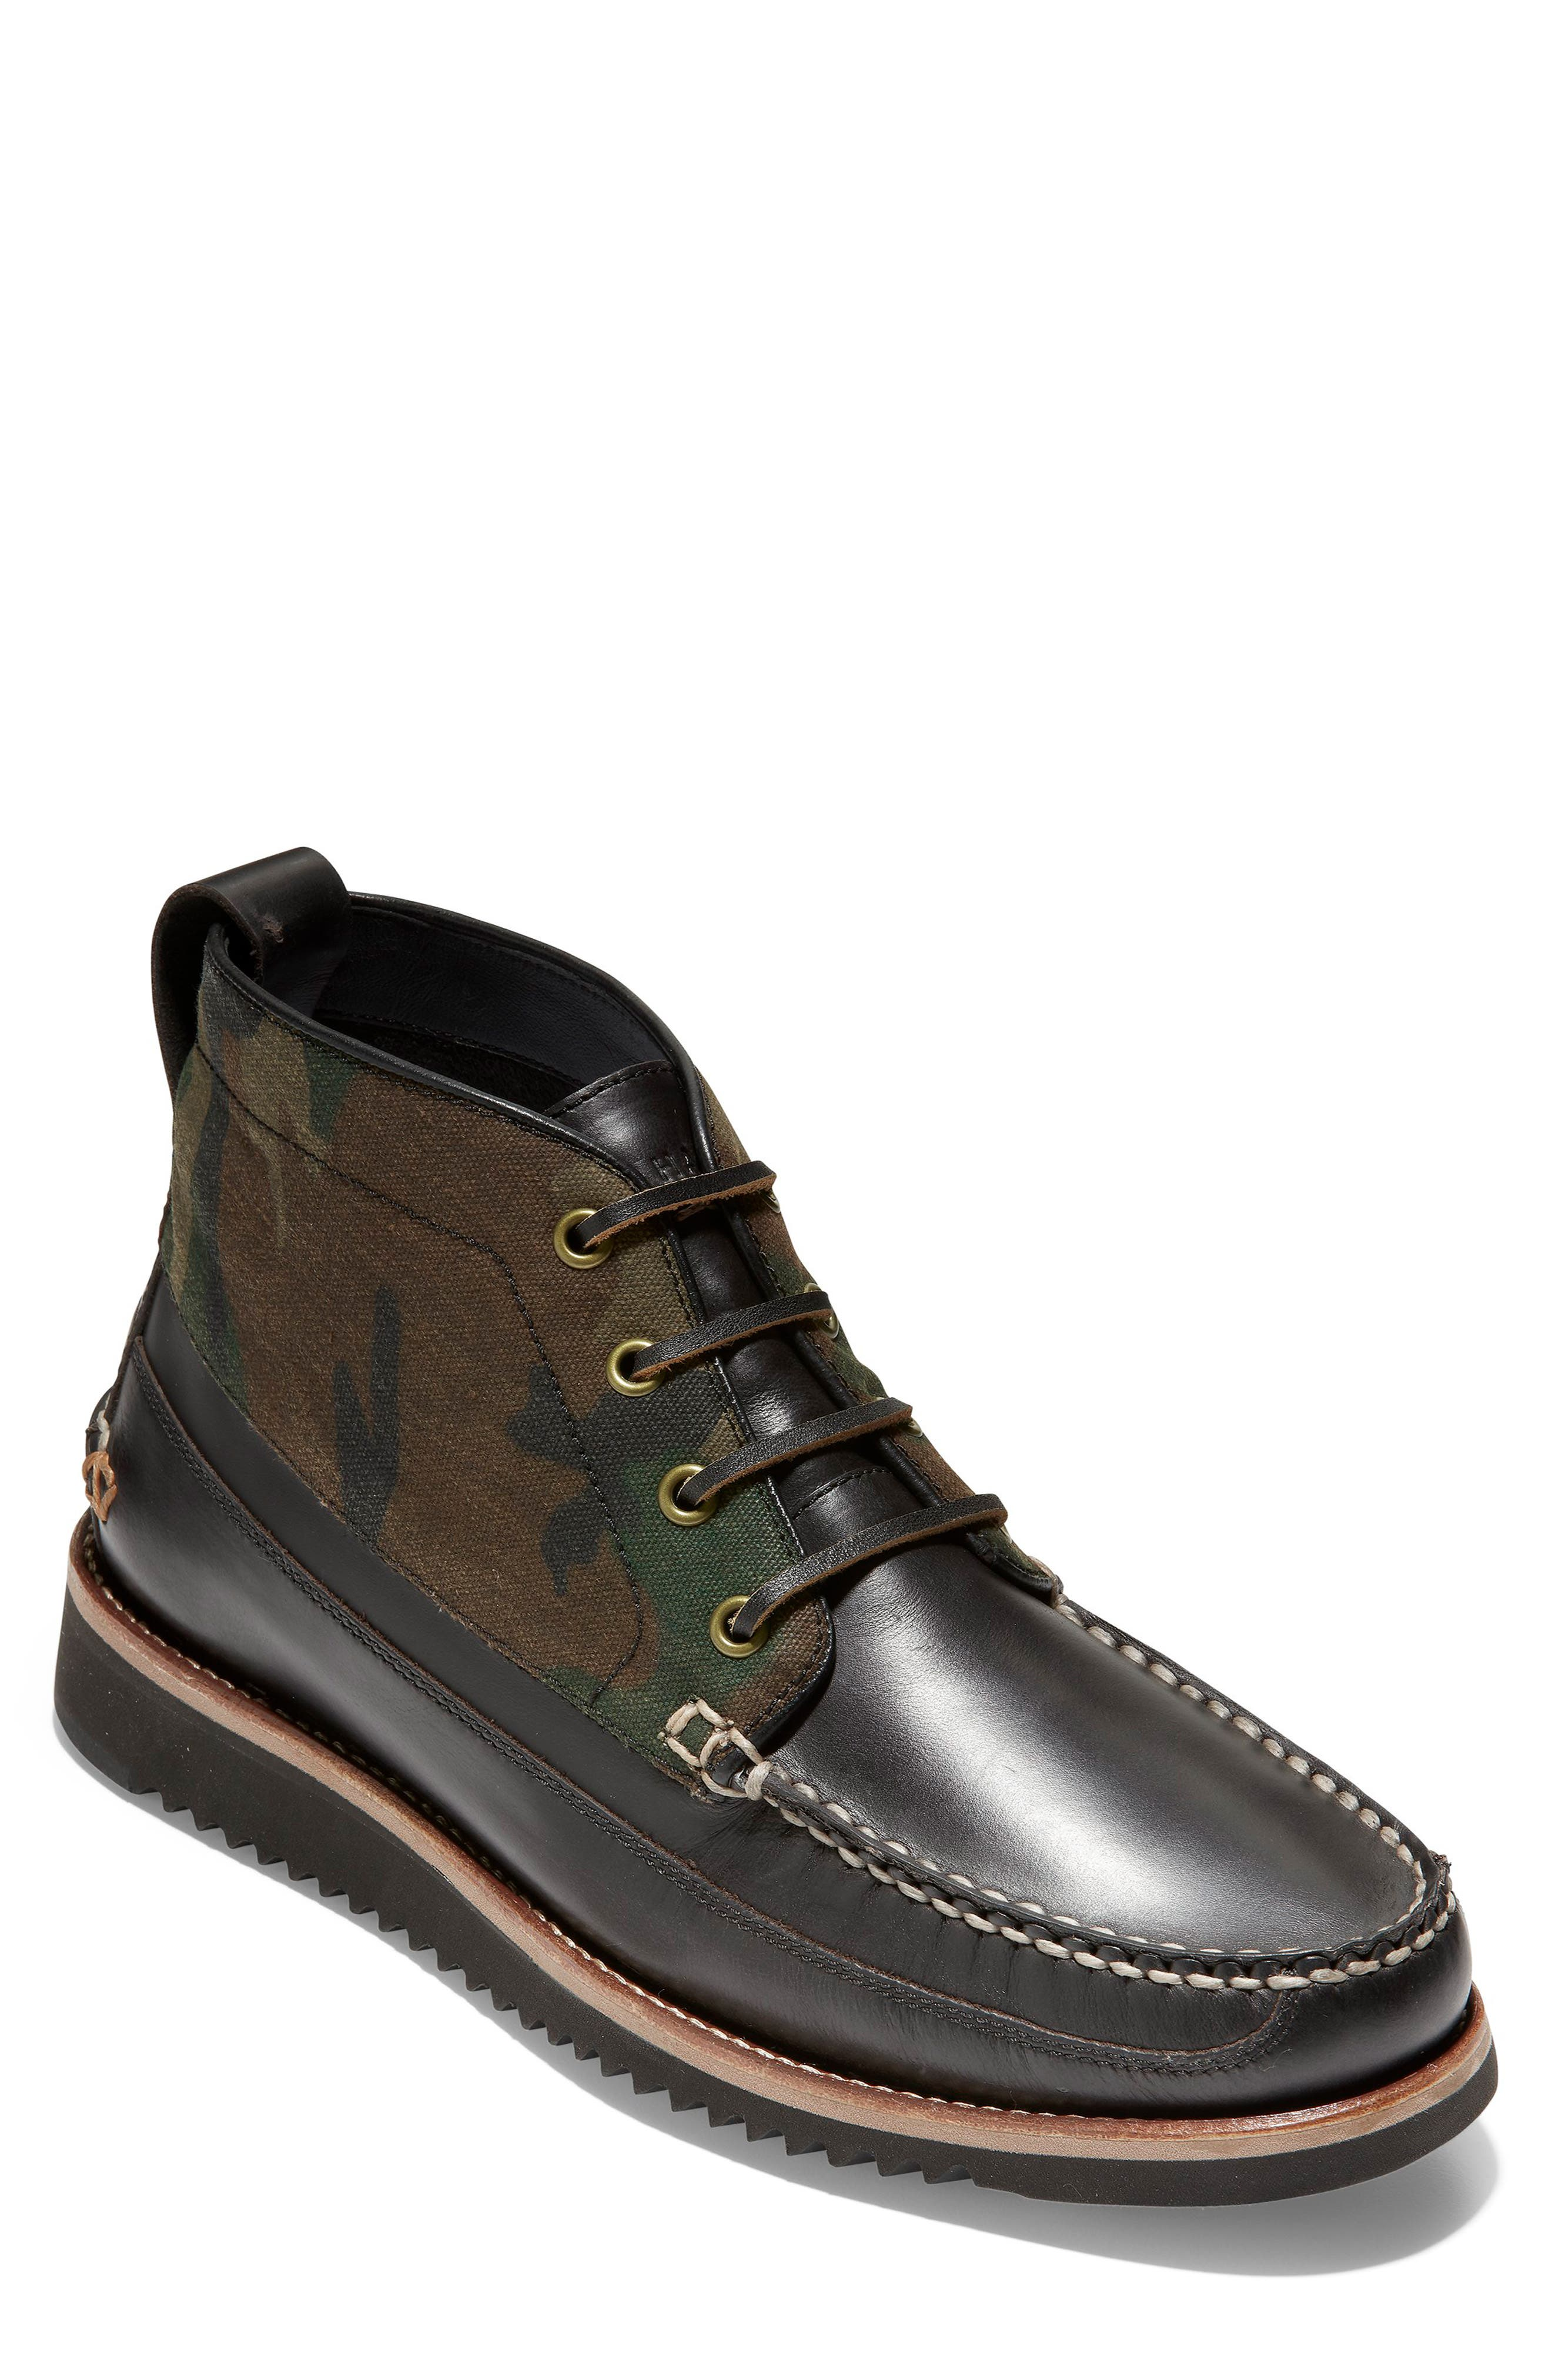 Pinch Moc Toe Boot,                         Main,                         color, CAMO CAVAS